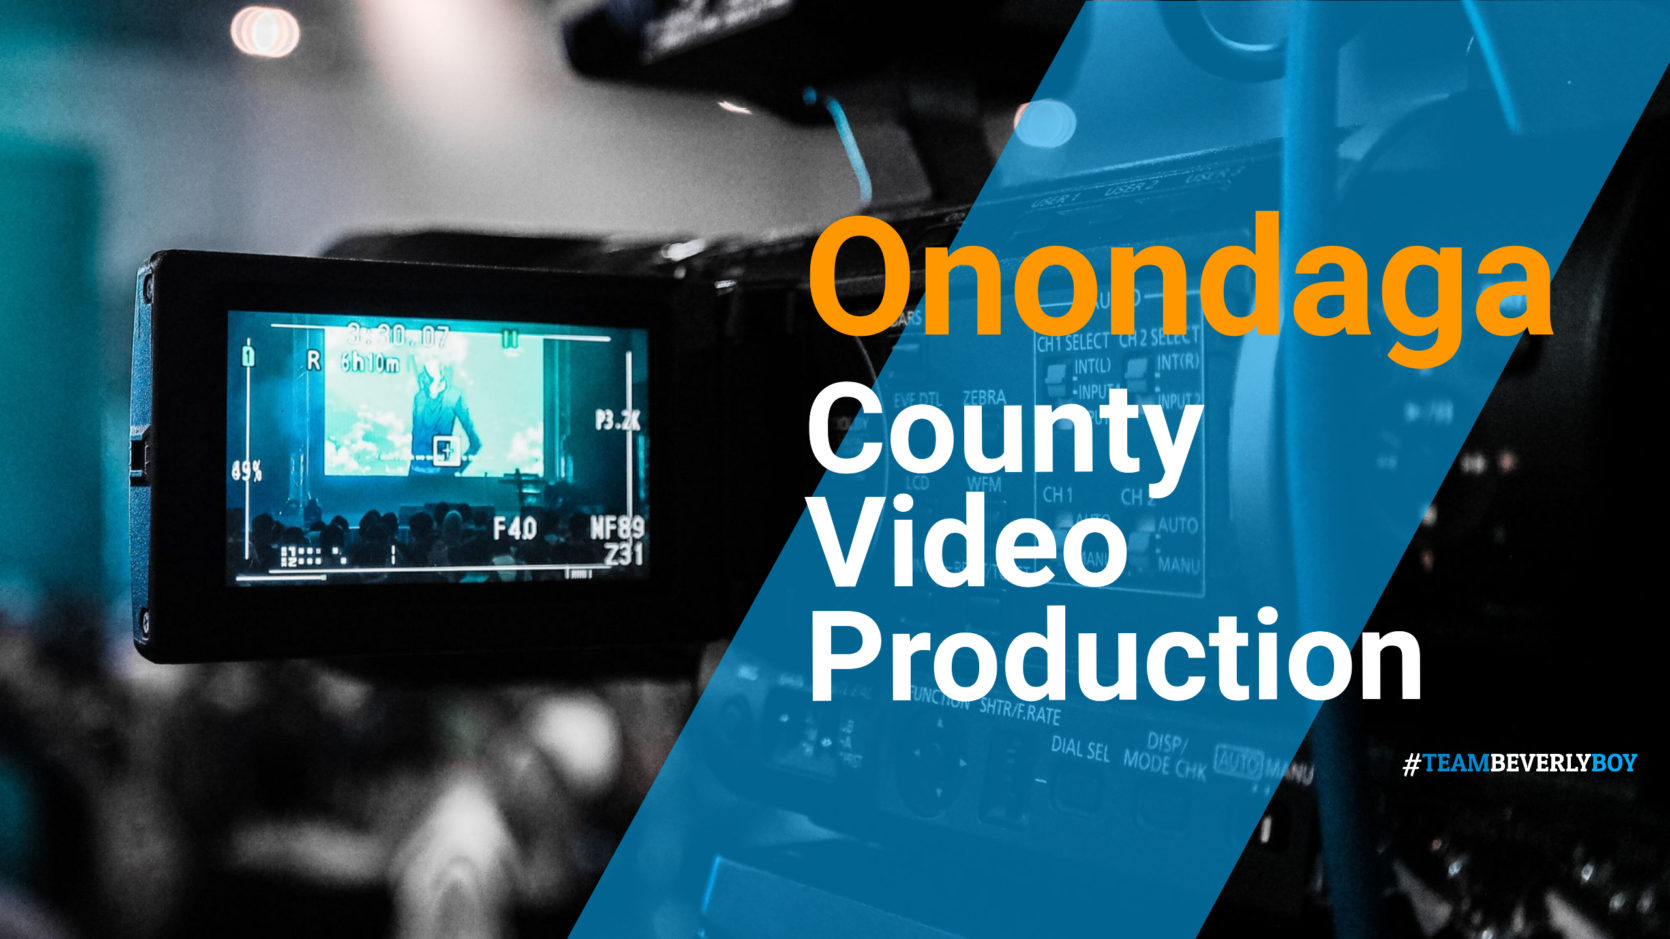 Onondaga county Video Production